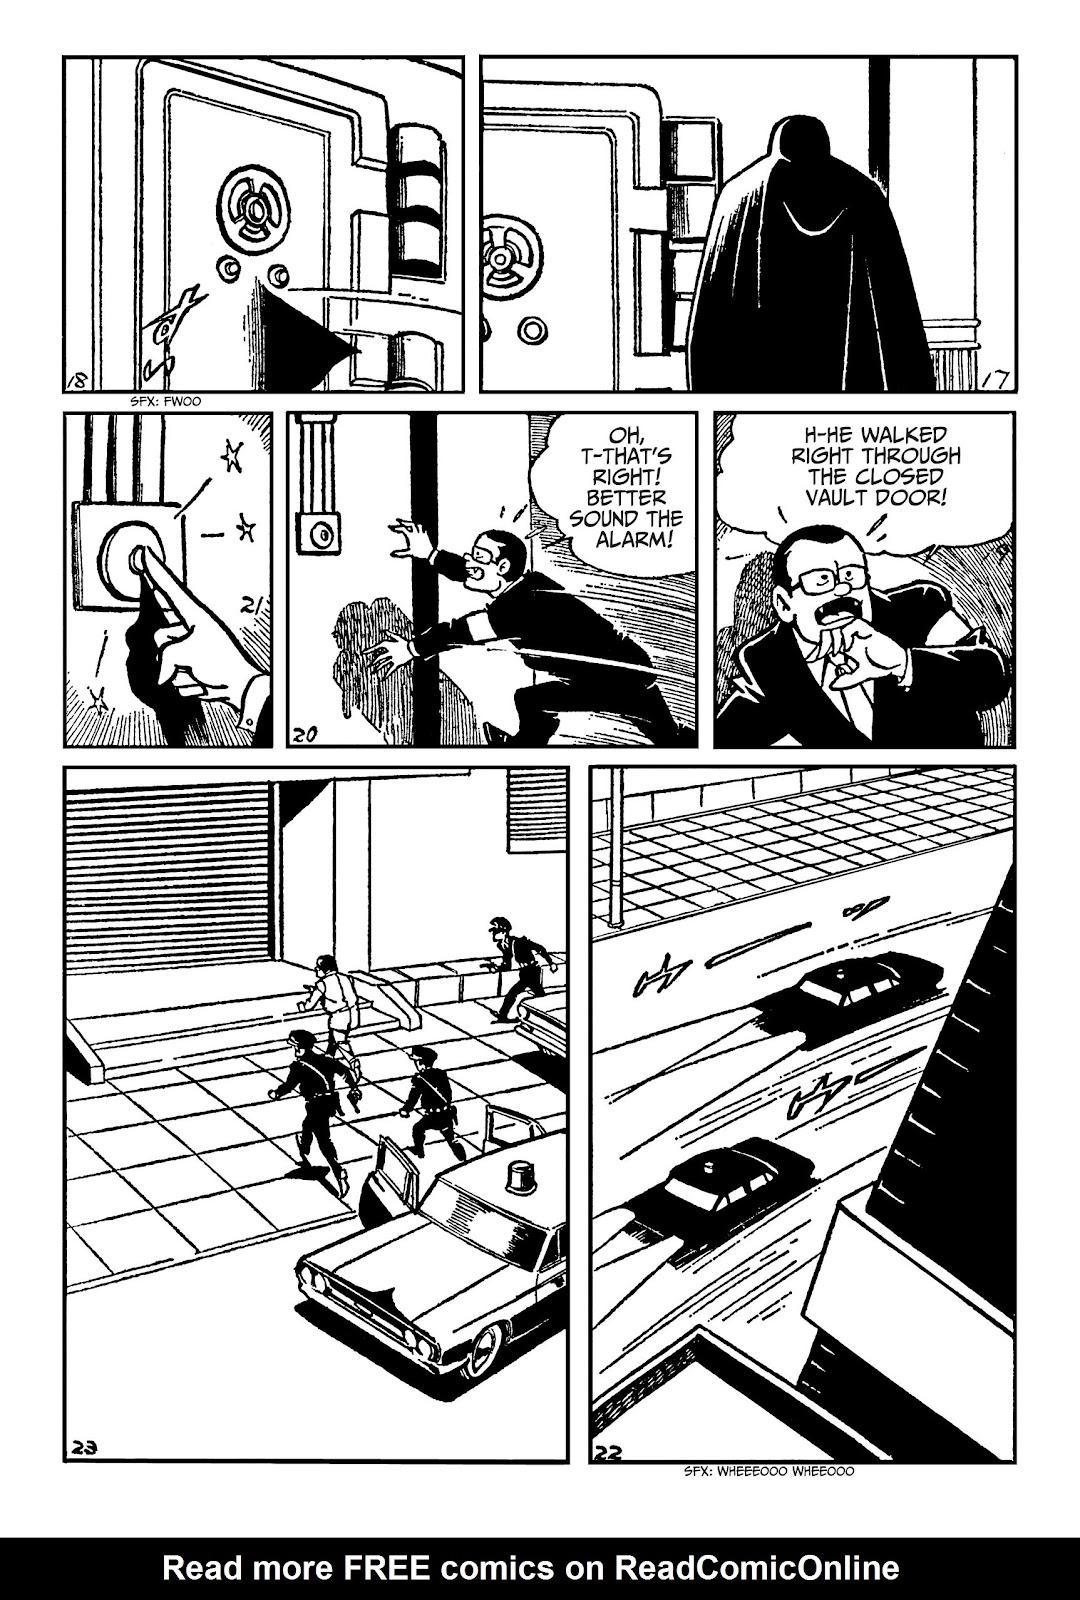 Read online Batman - The Jiro Kuwata Batmanga comic -  Issue #51 - 7